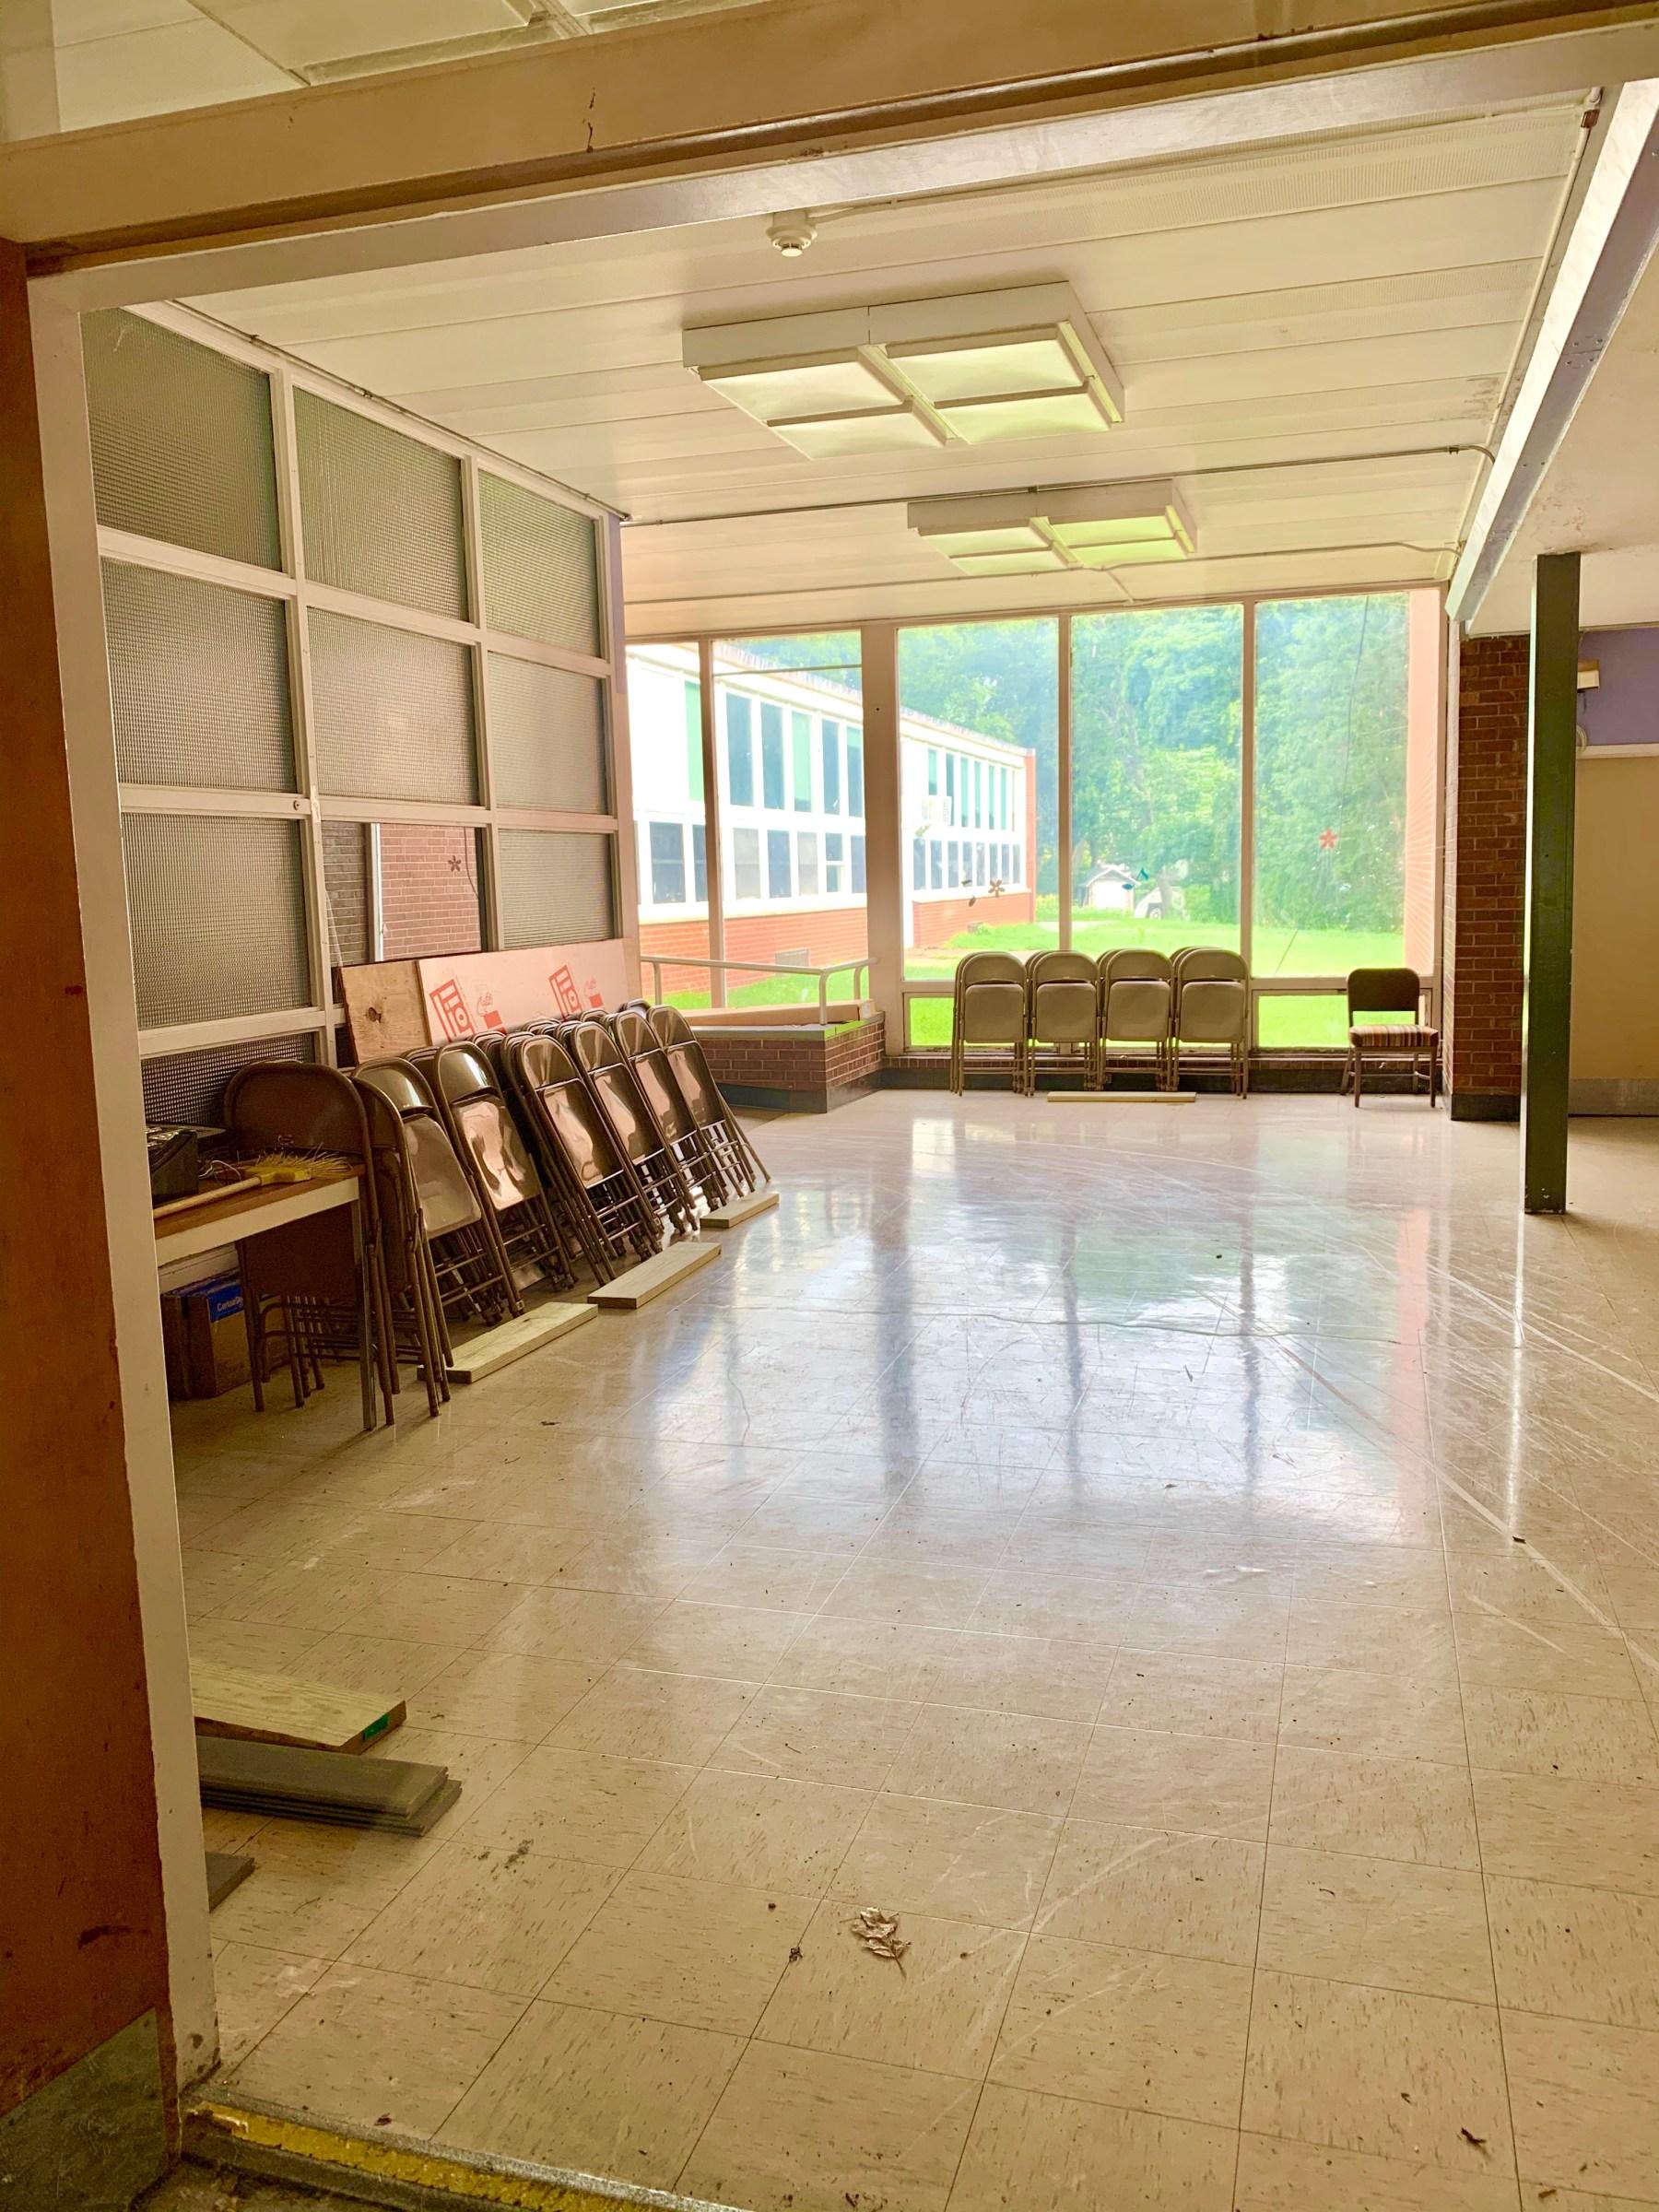 Daniel P. Hurld Elementary School 7 Woburn MA